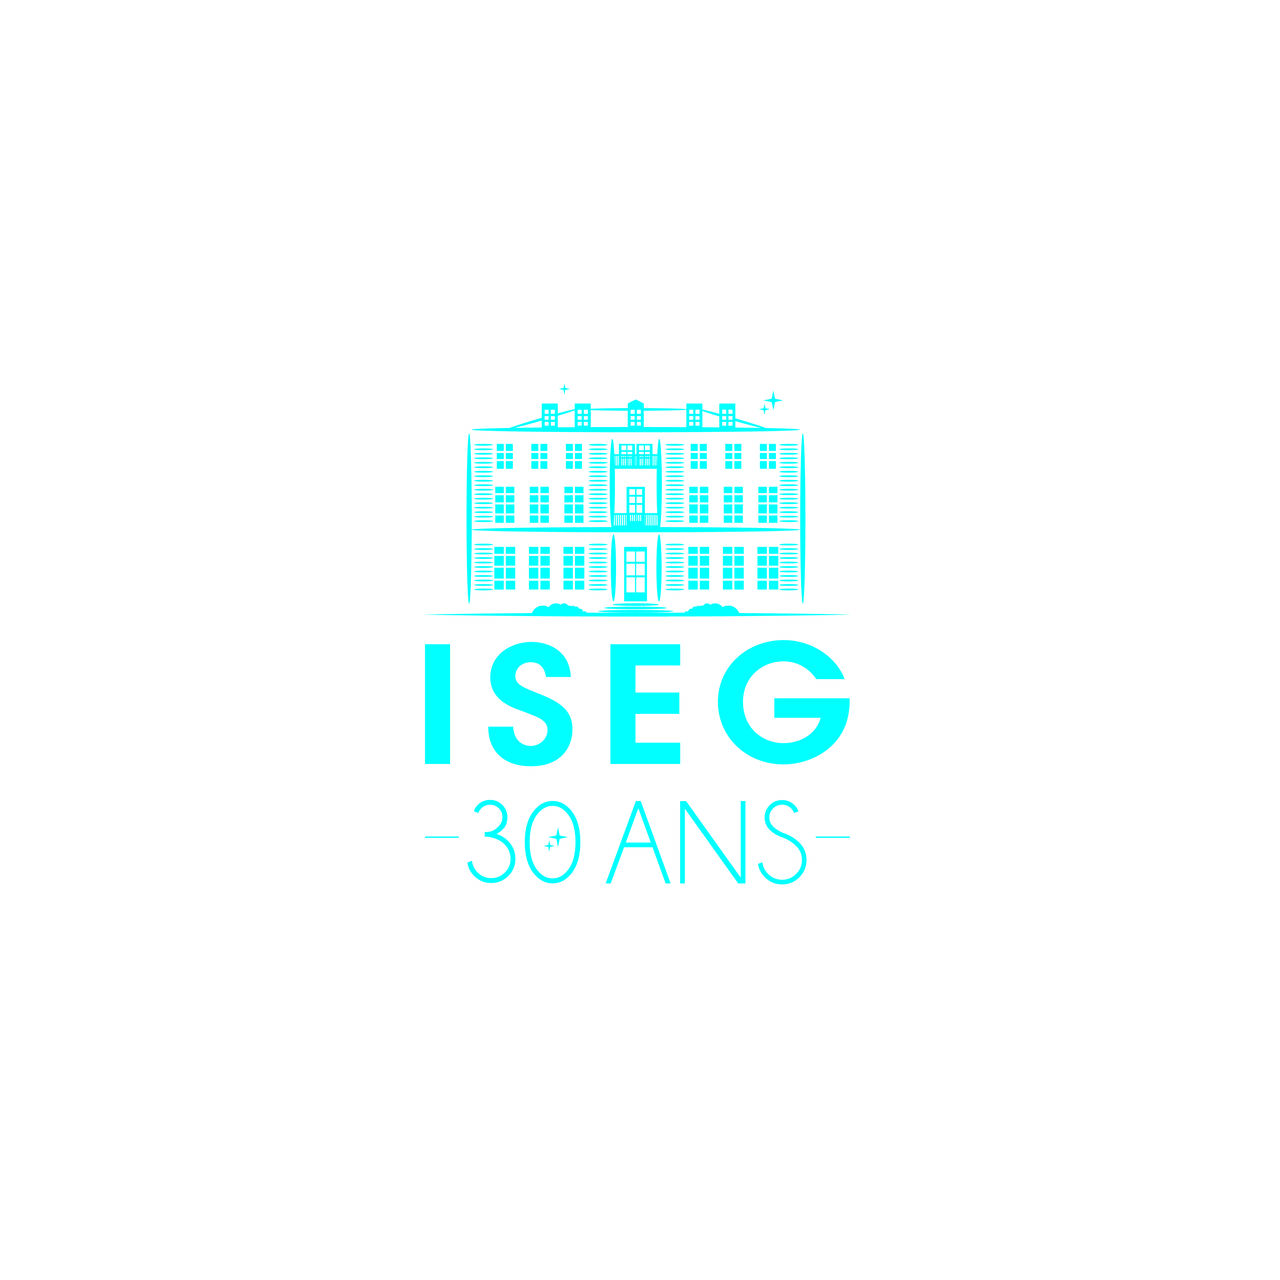 Logo ISEG 30 Ans